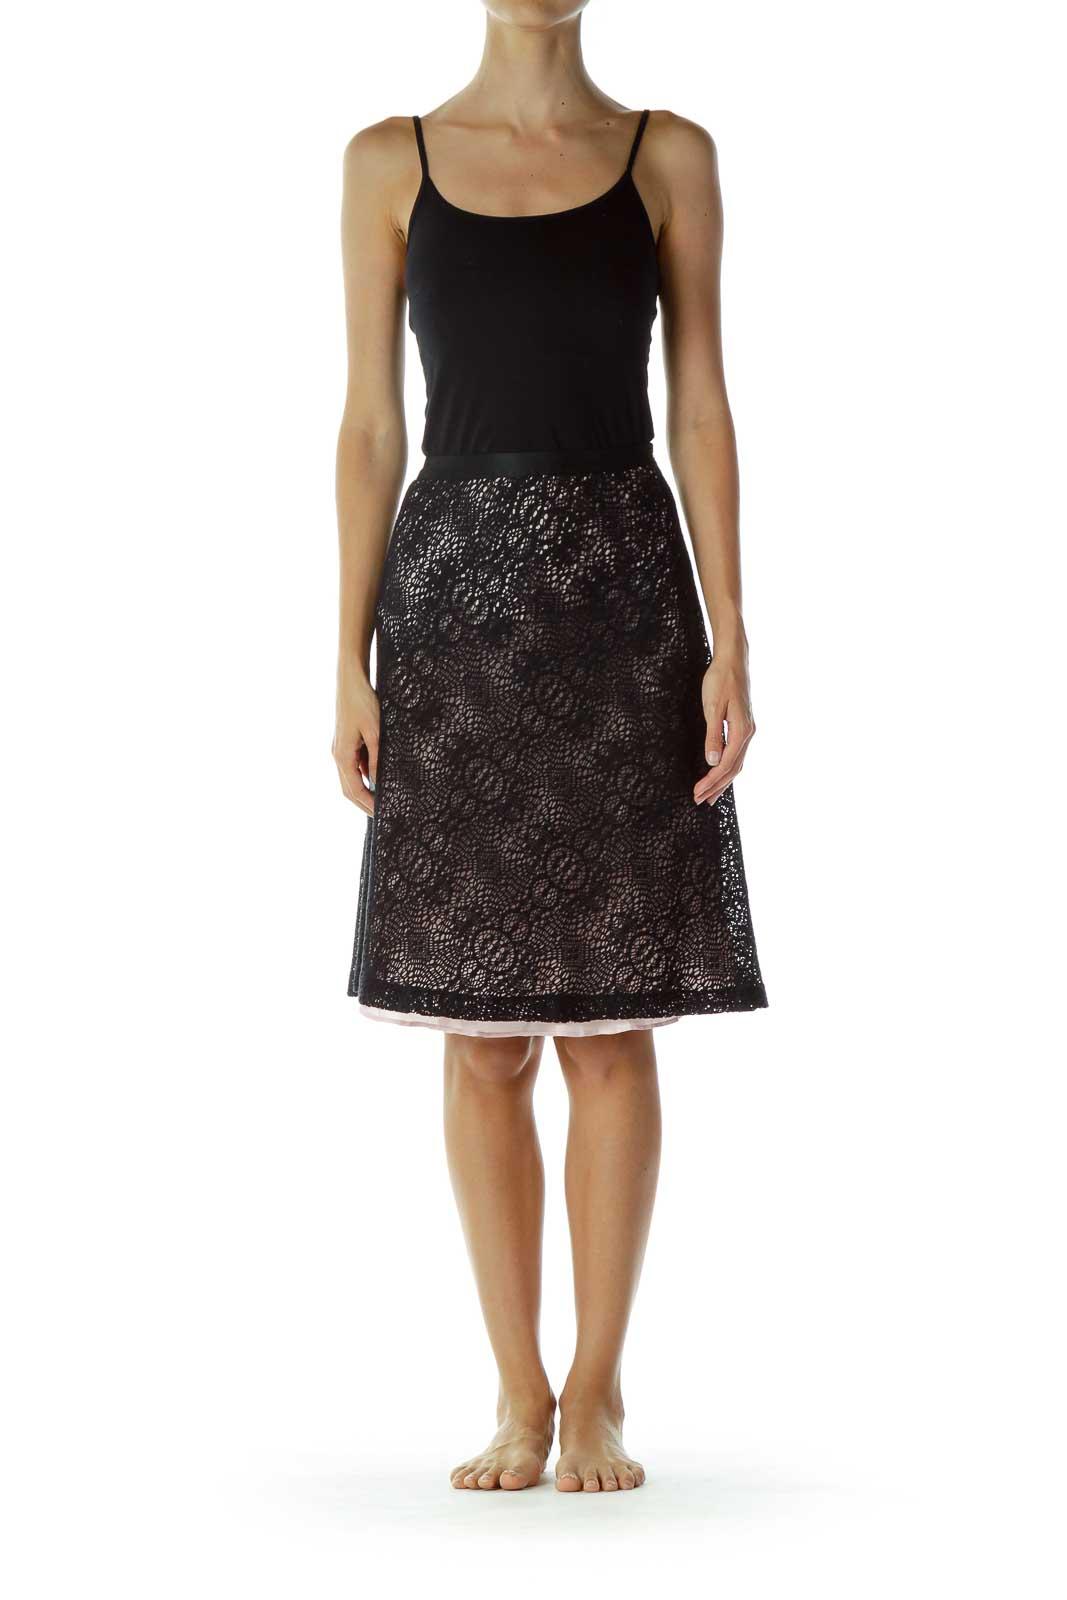 Black & Pink Lace Skirt